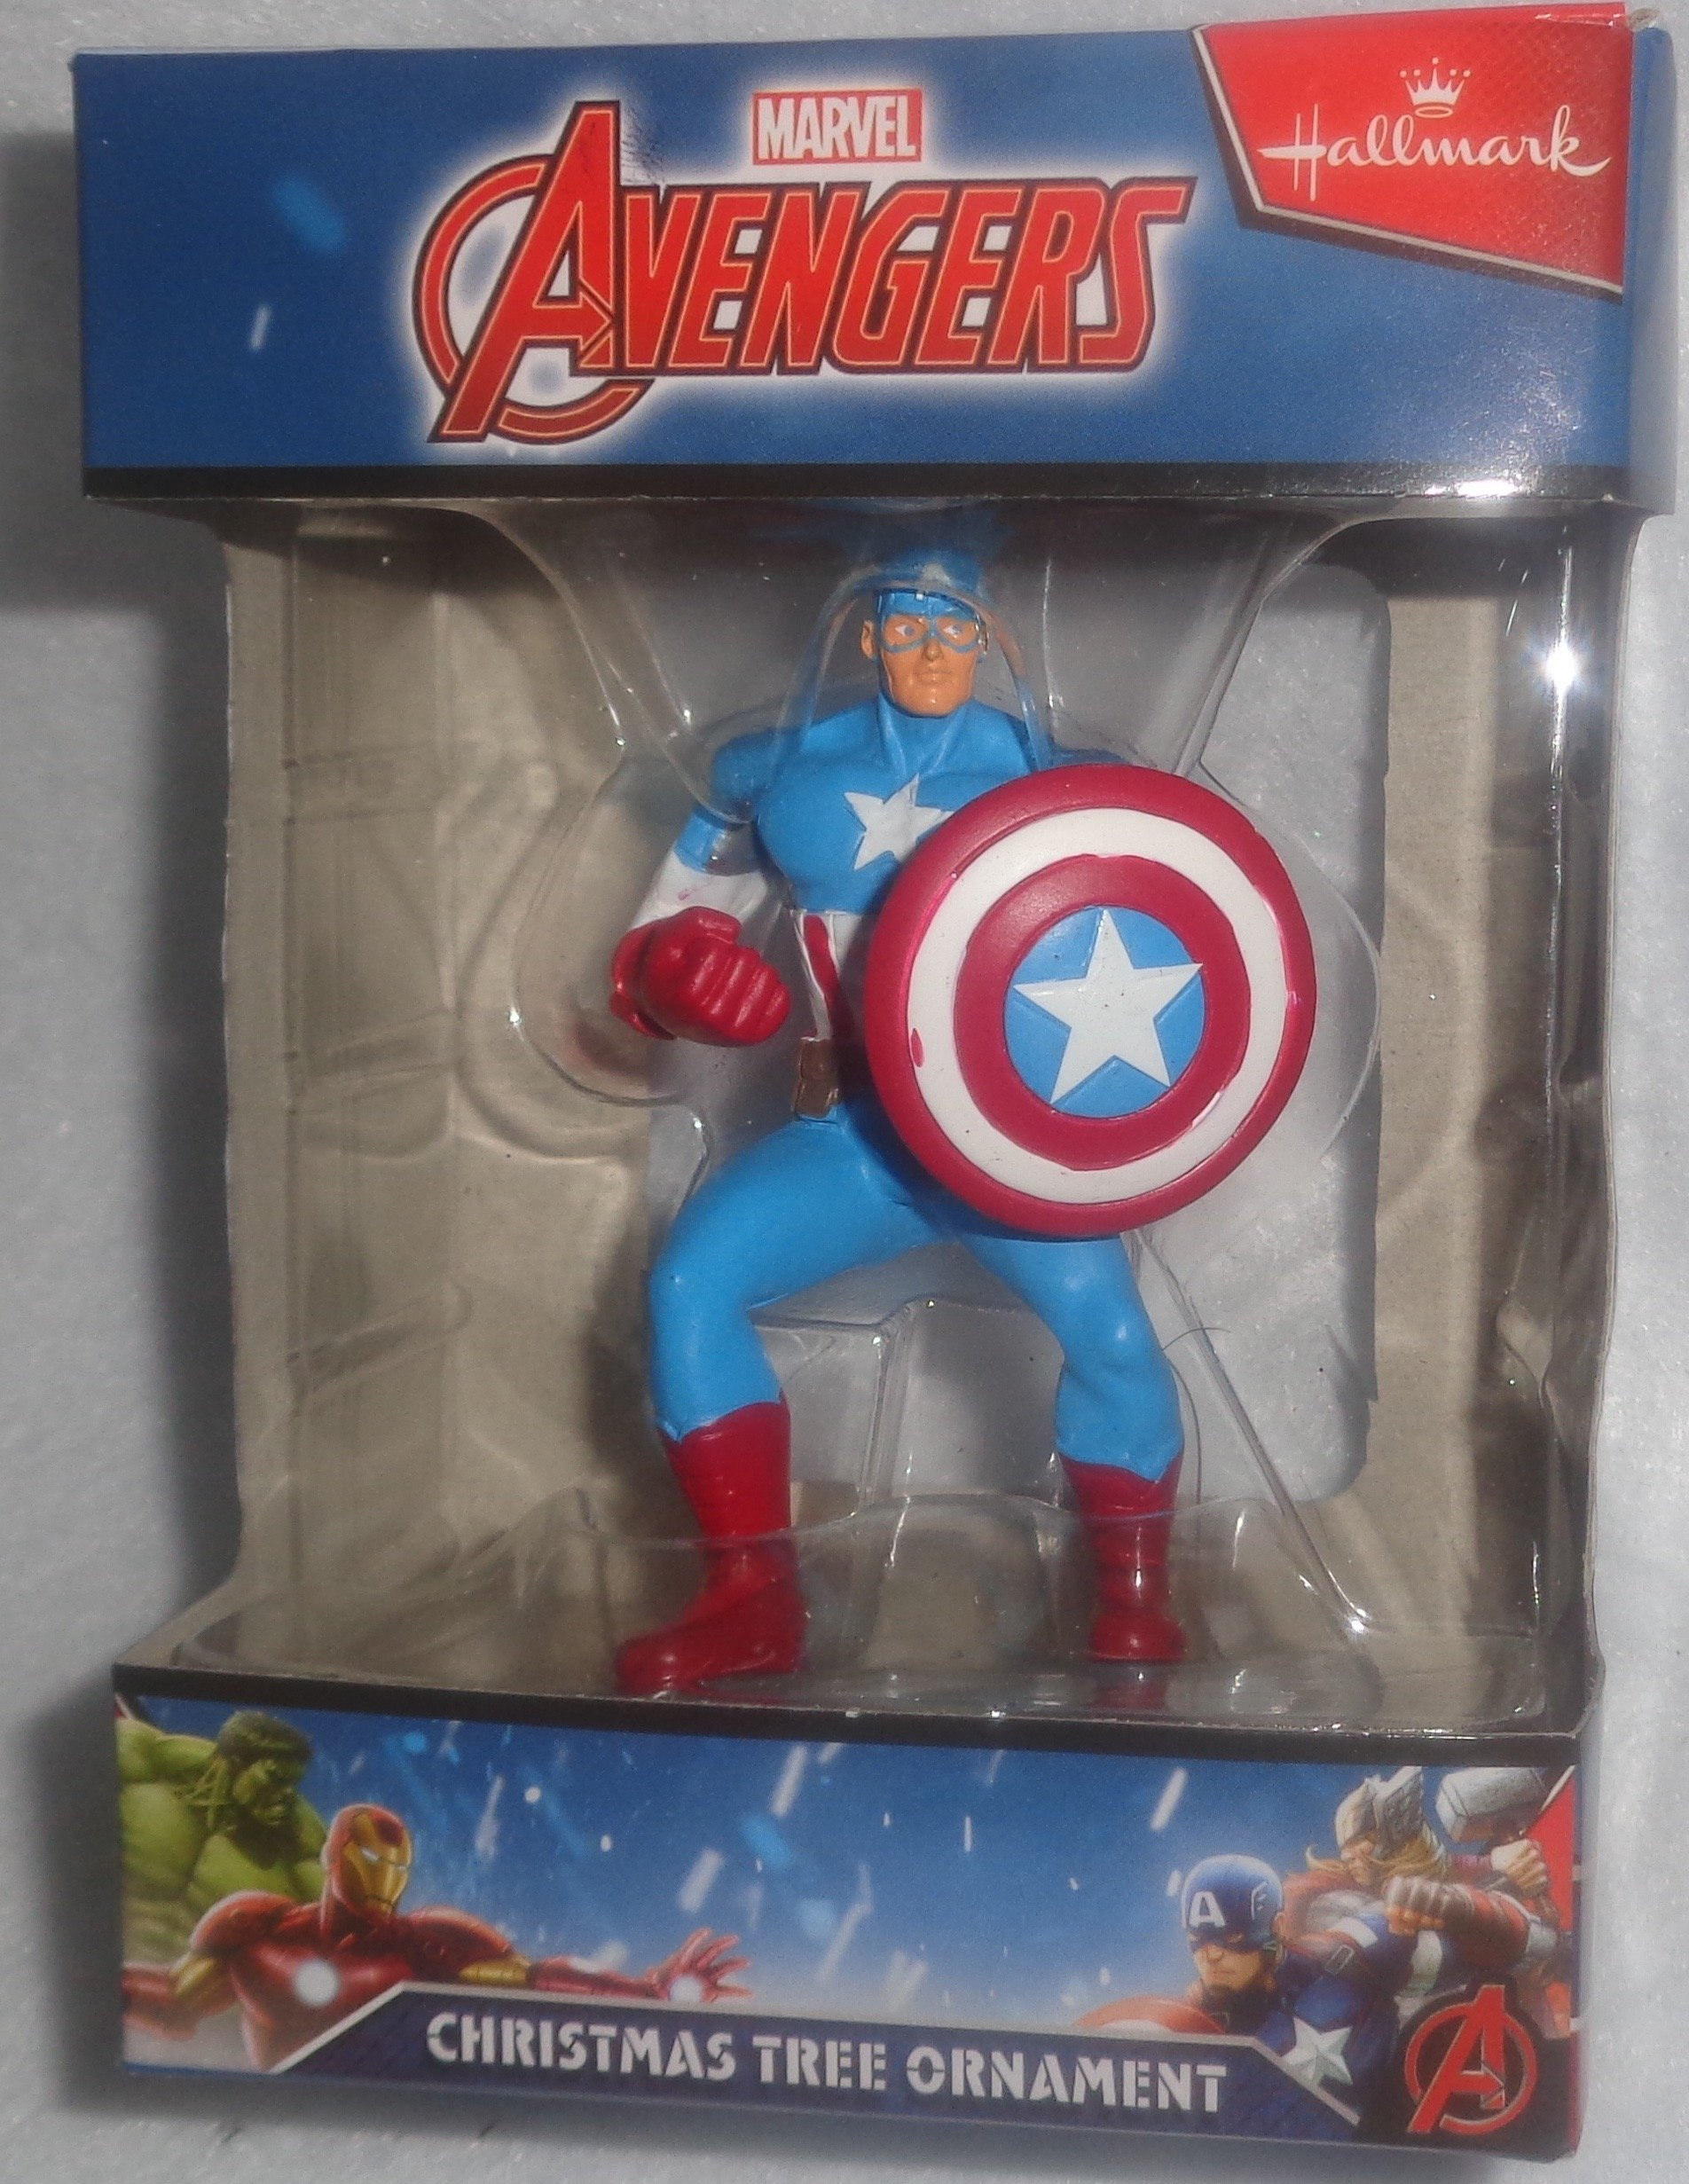 Hallmark Captain America Ornament by